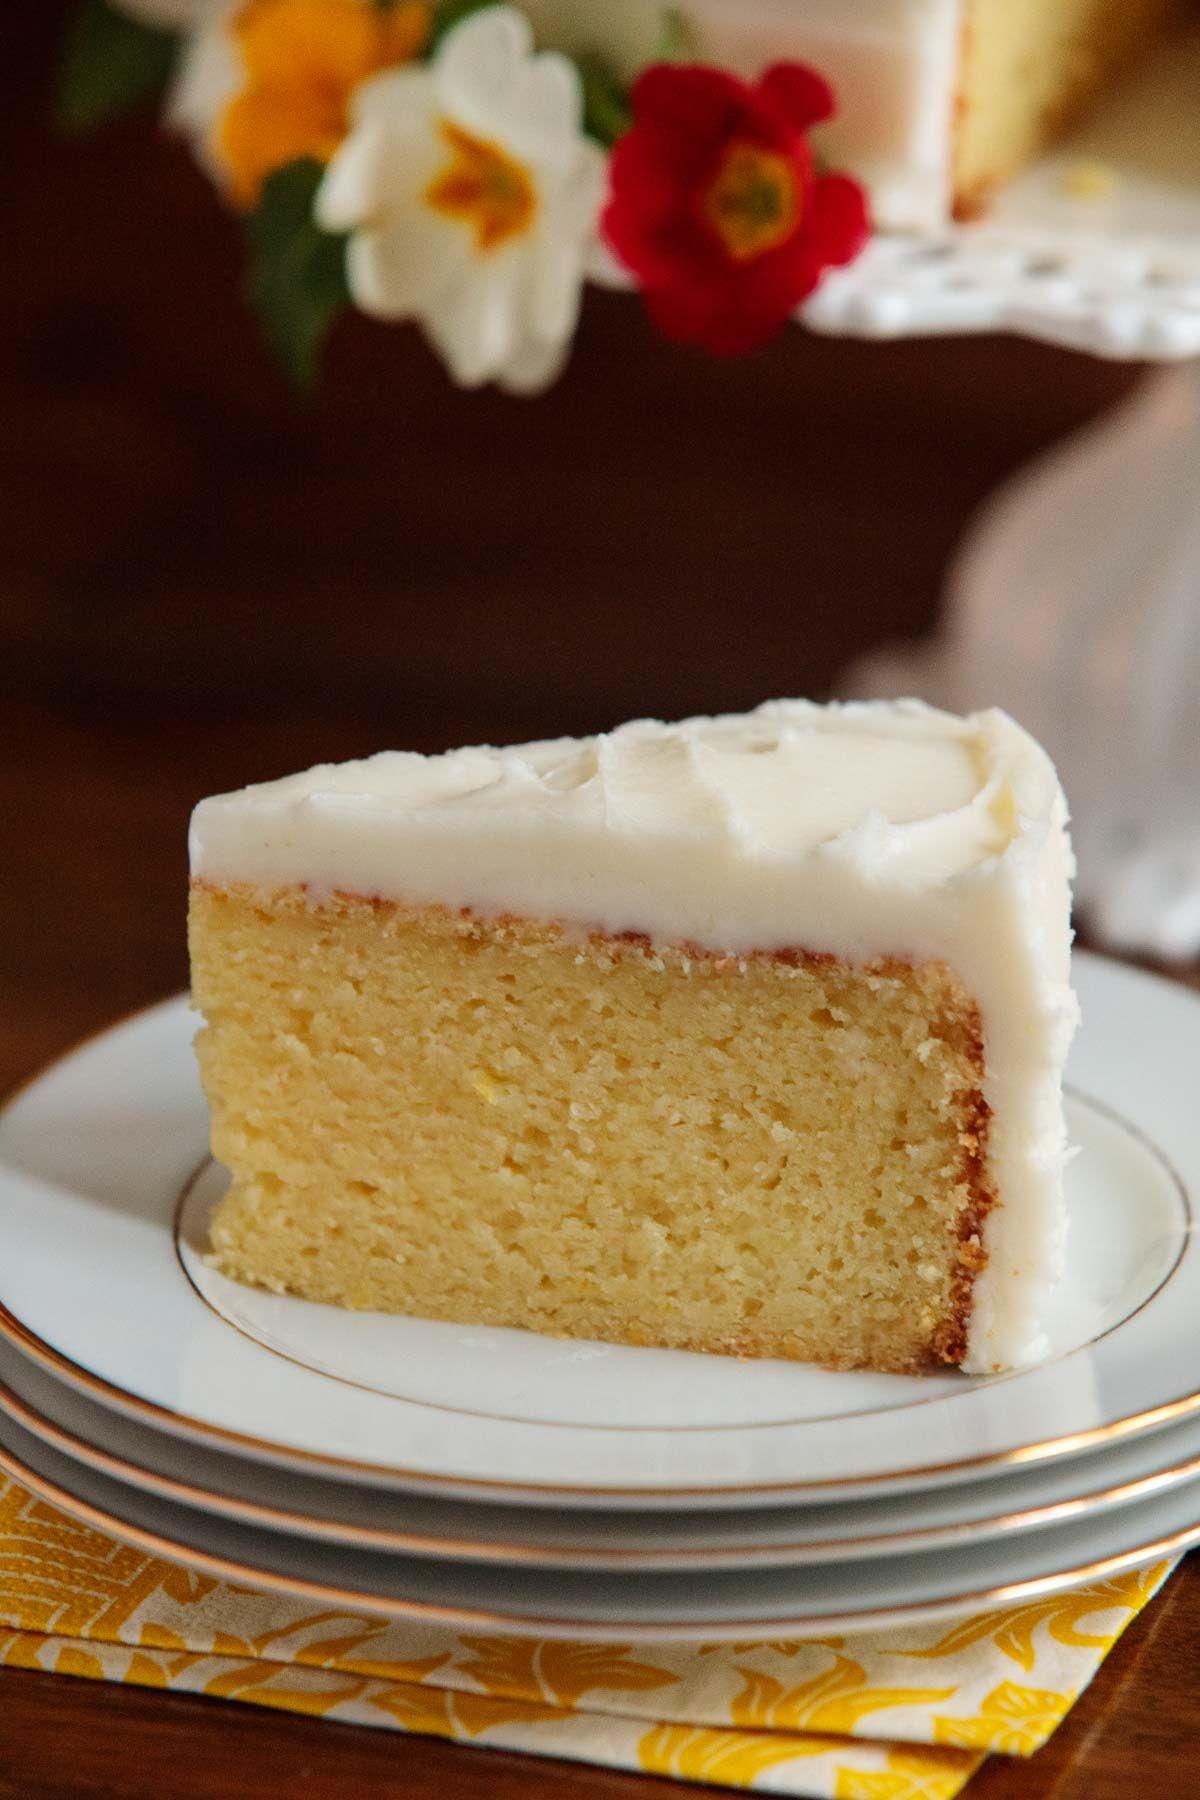 Lemon Ricotta Cake Recipe Cake Recipes Desserts Lemon Ricotta Cake